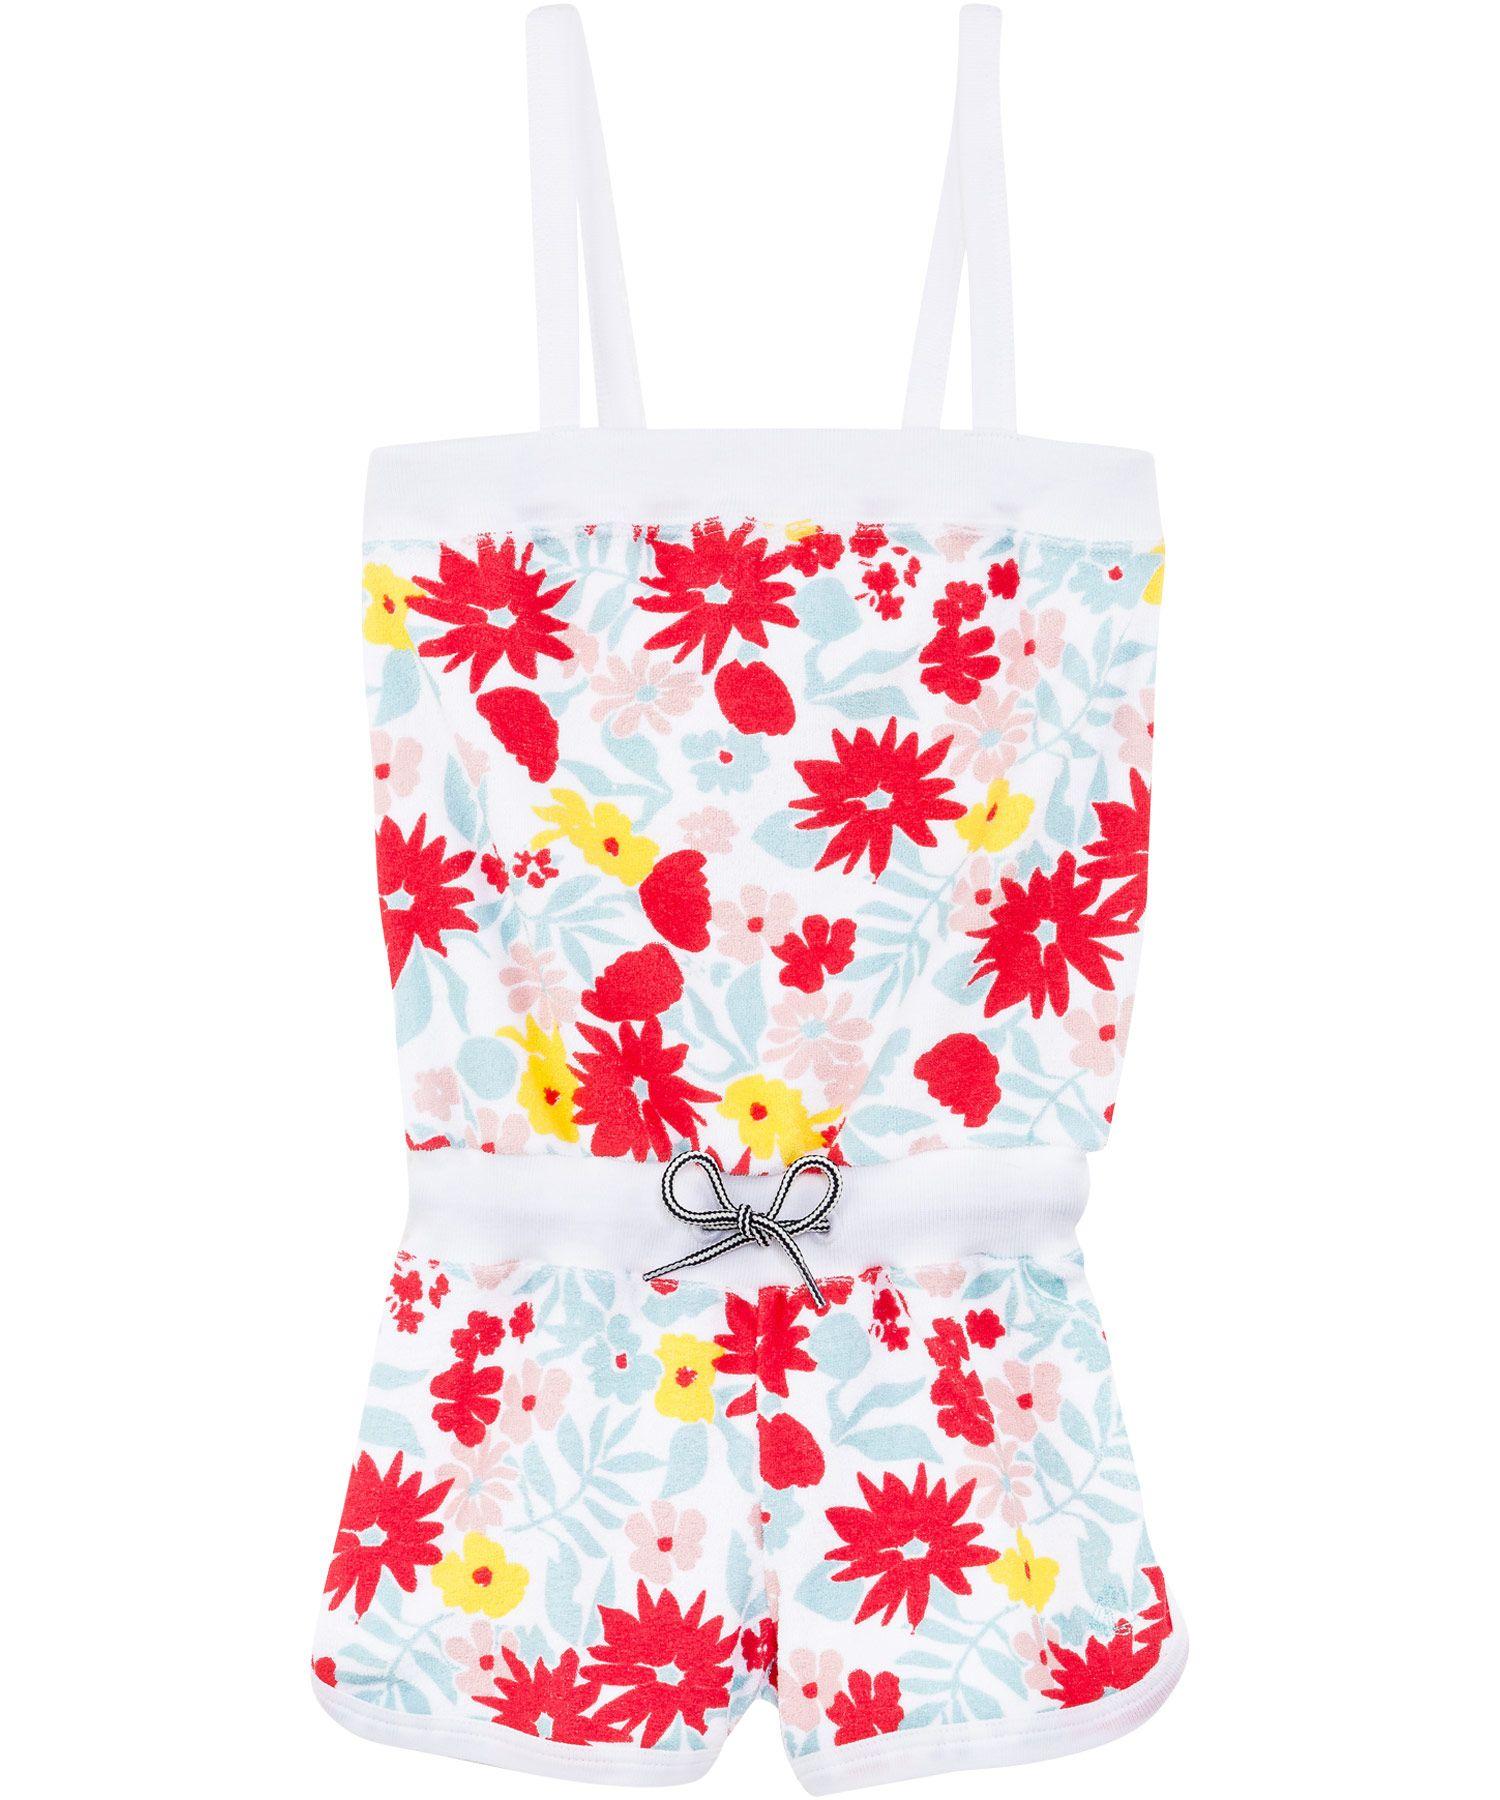 Petit Bateau fantastisch sponzen jumpsuit met bloemetjes #emilea